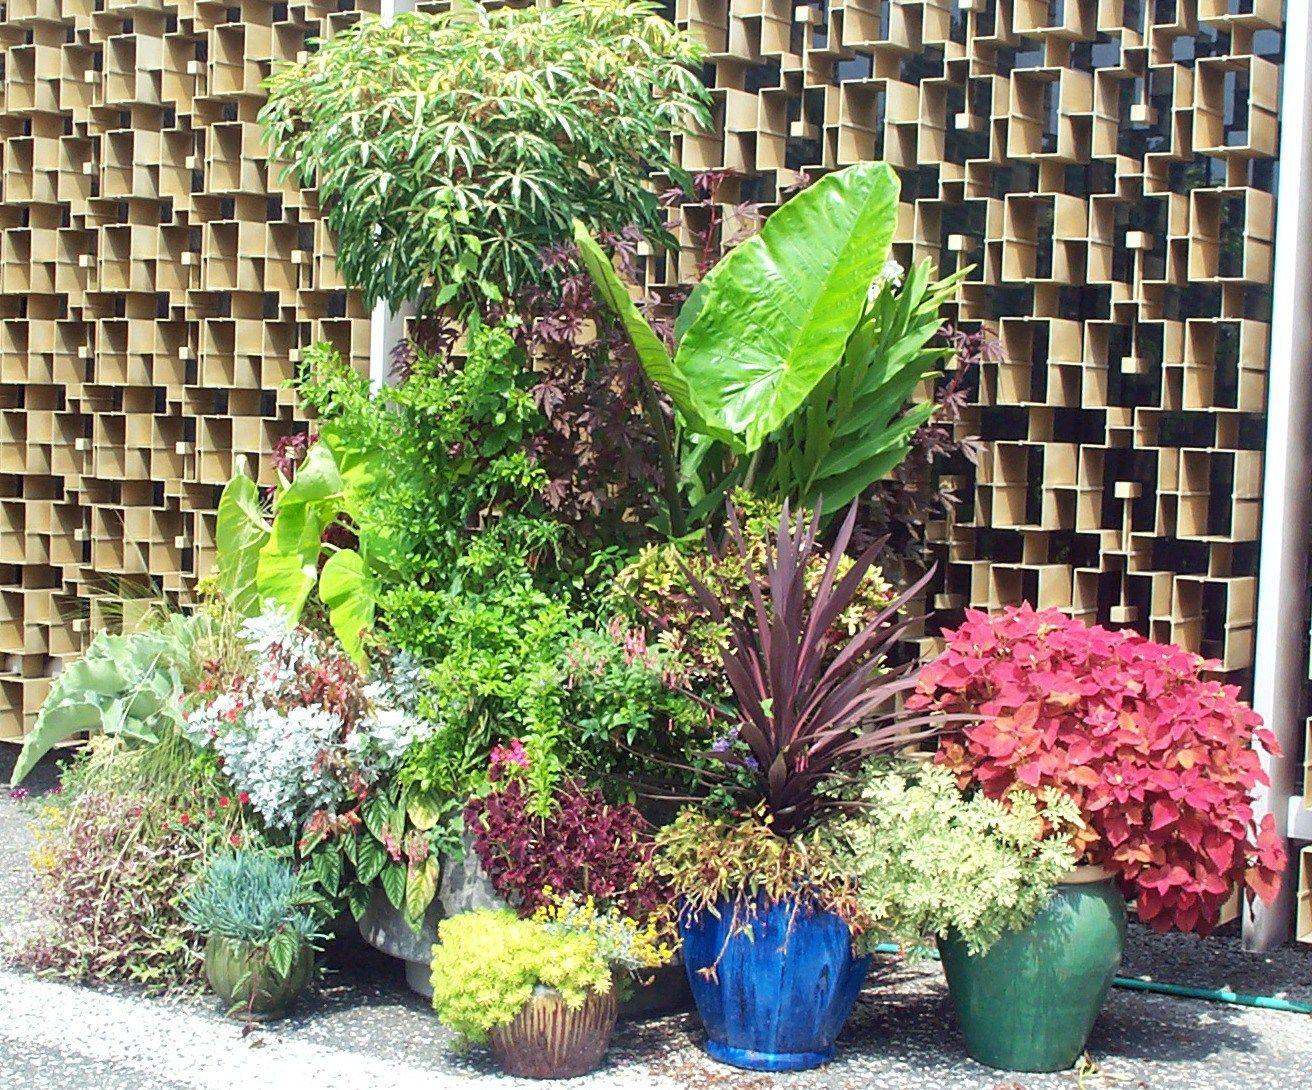 aug 28 050jpg 13121090 pixels Gardening Pinterest Patios